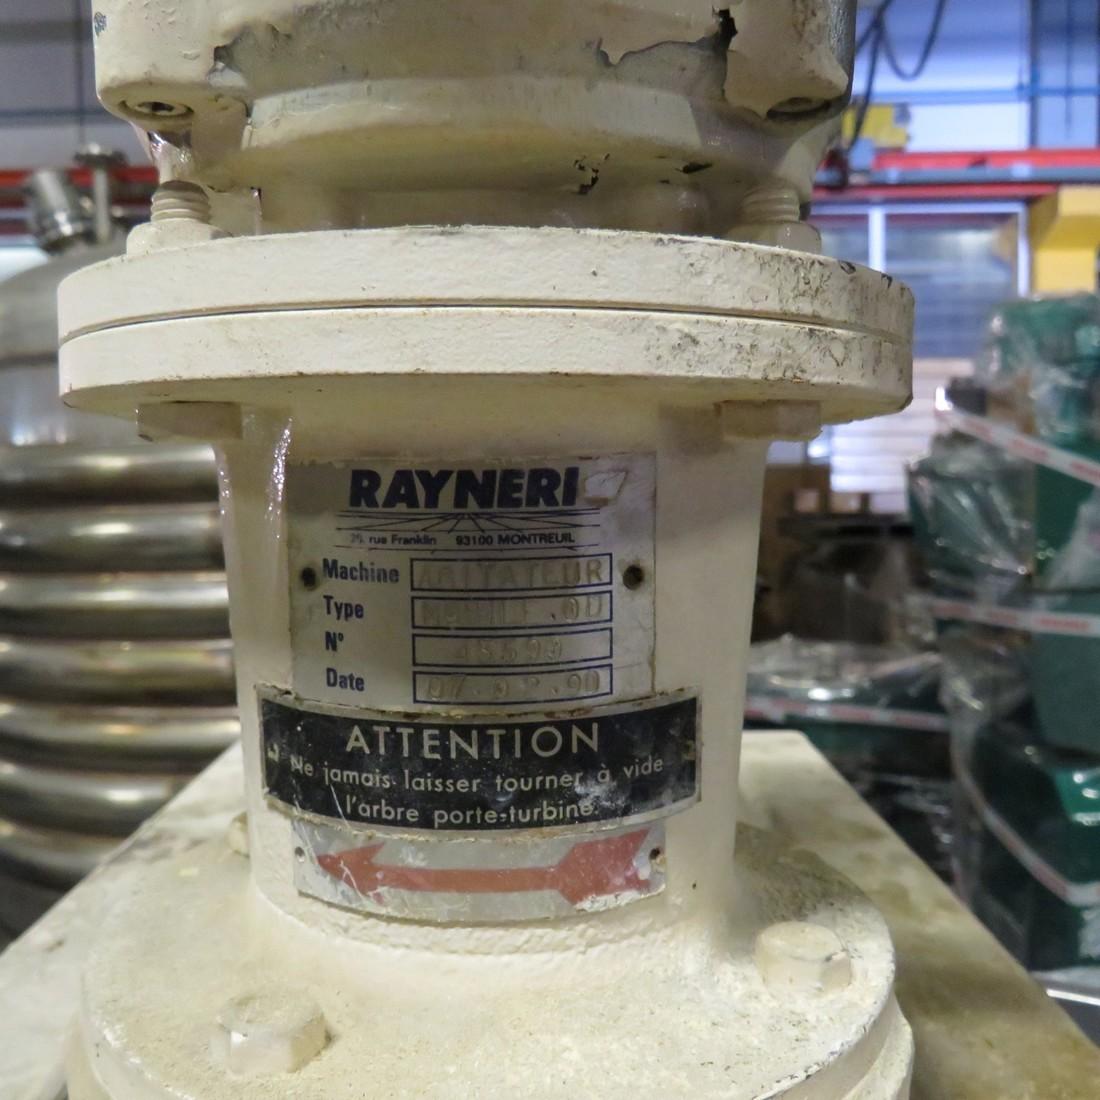 R15A992 Mixing skid with RAYNERI agitator